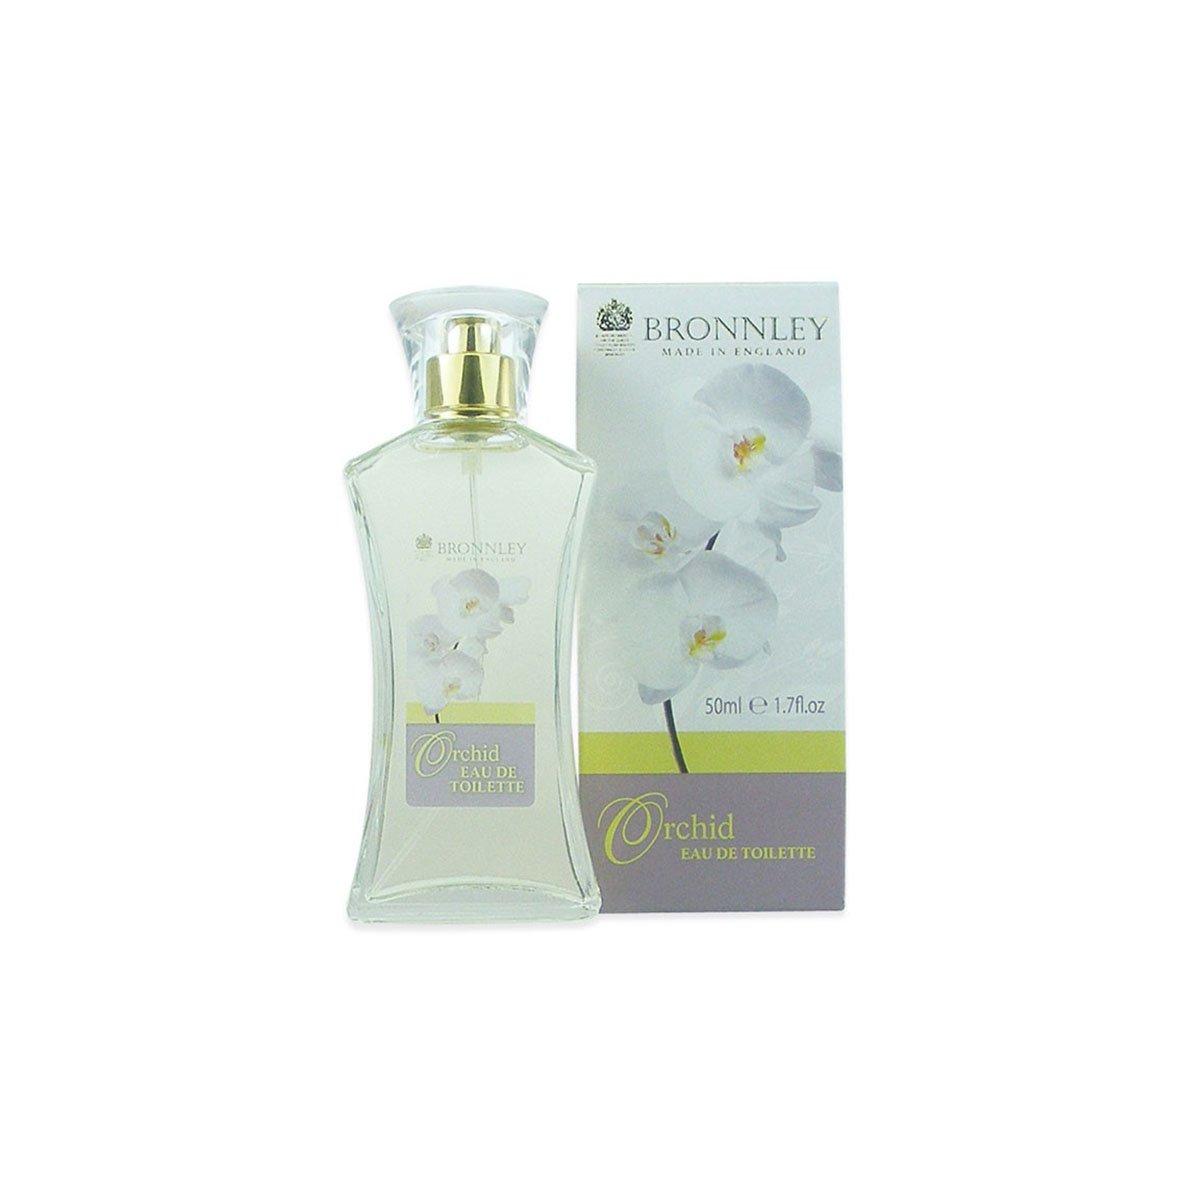 Bronnley Orchid Eau de Toilette 50ml H. Bronnley & Co. UK Ltd 052546 B006DLDZG6